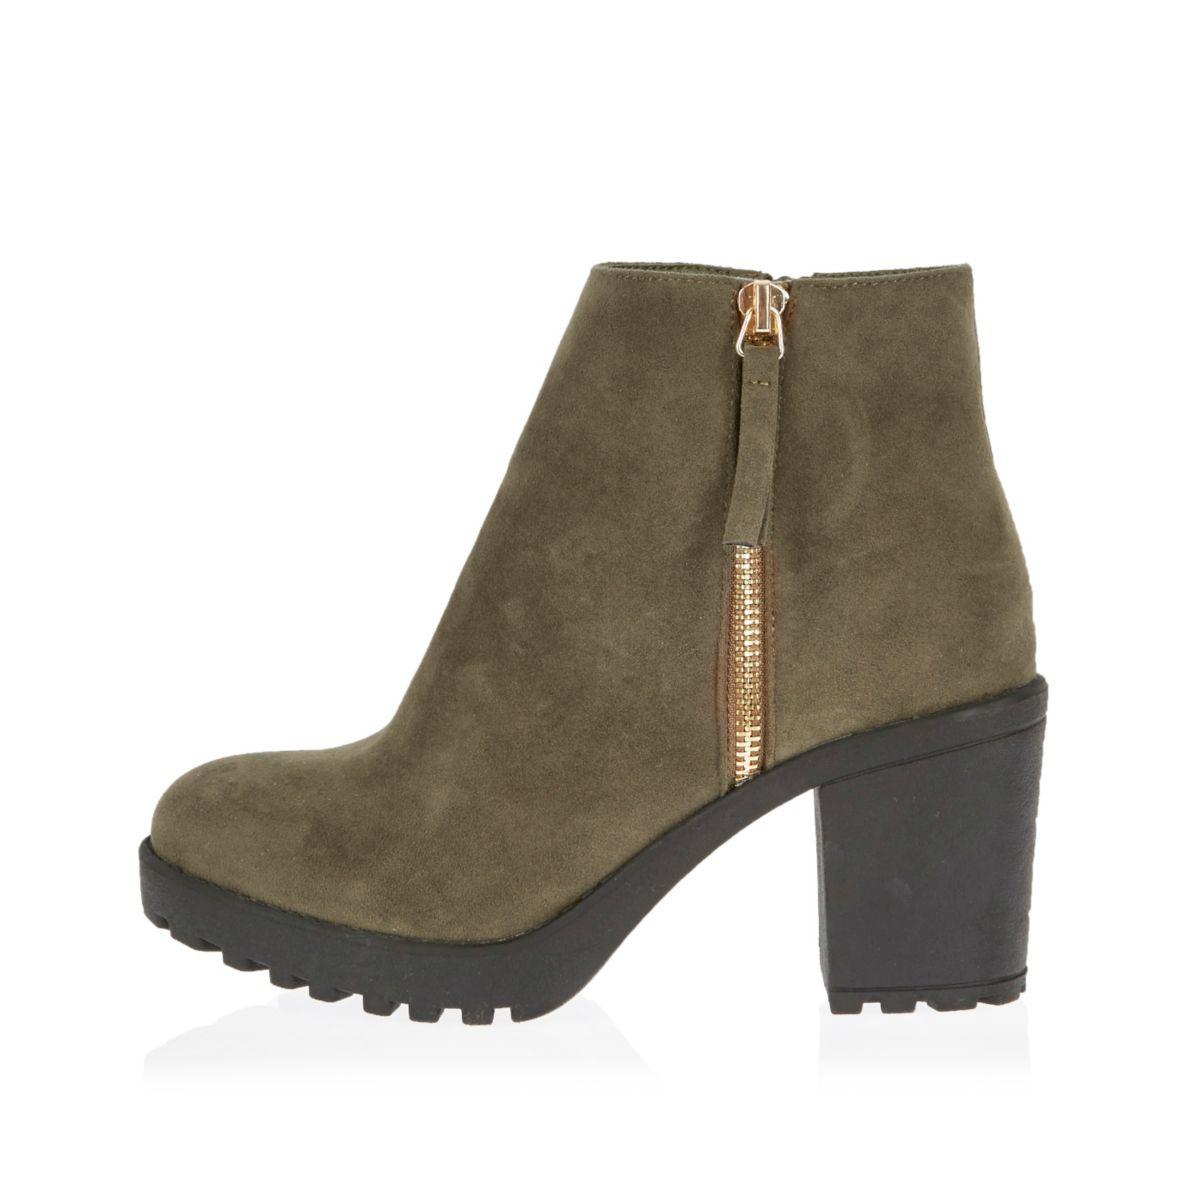 bottines kaki talons carr s chaussures bottes promos femme. Black Bedroom Furniture Sets. Home Design Ideas